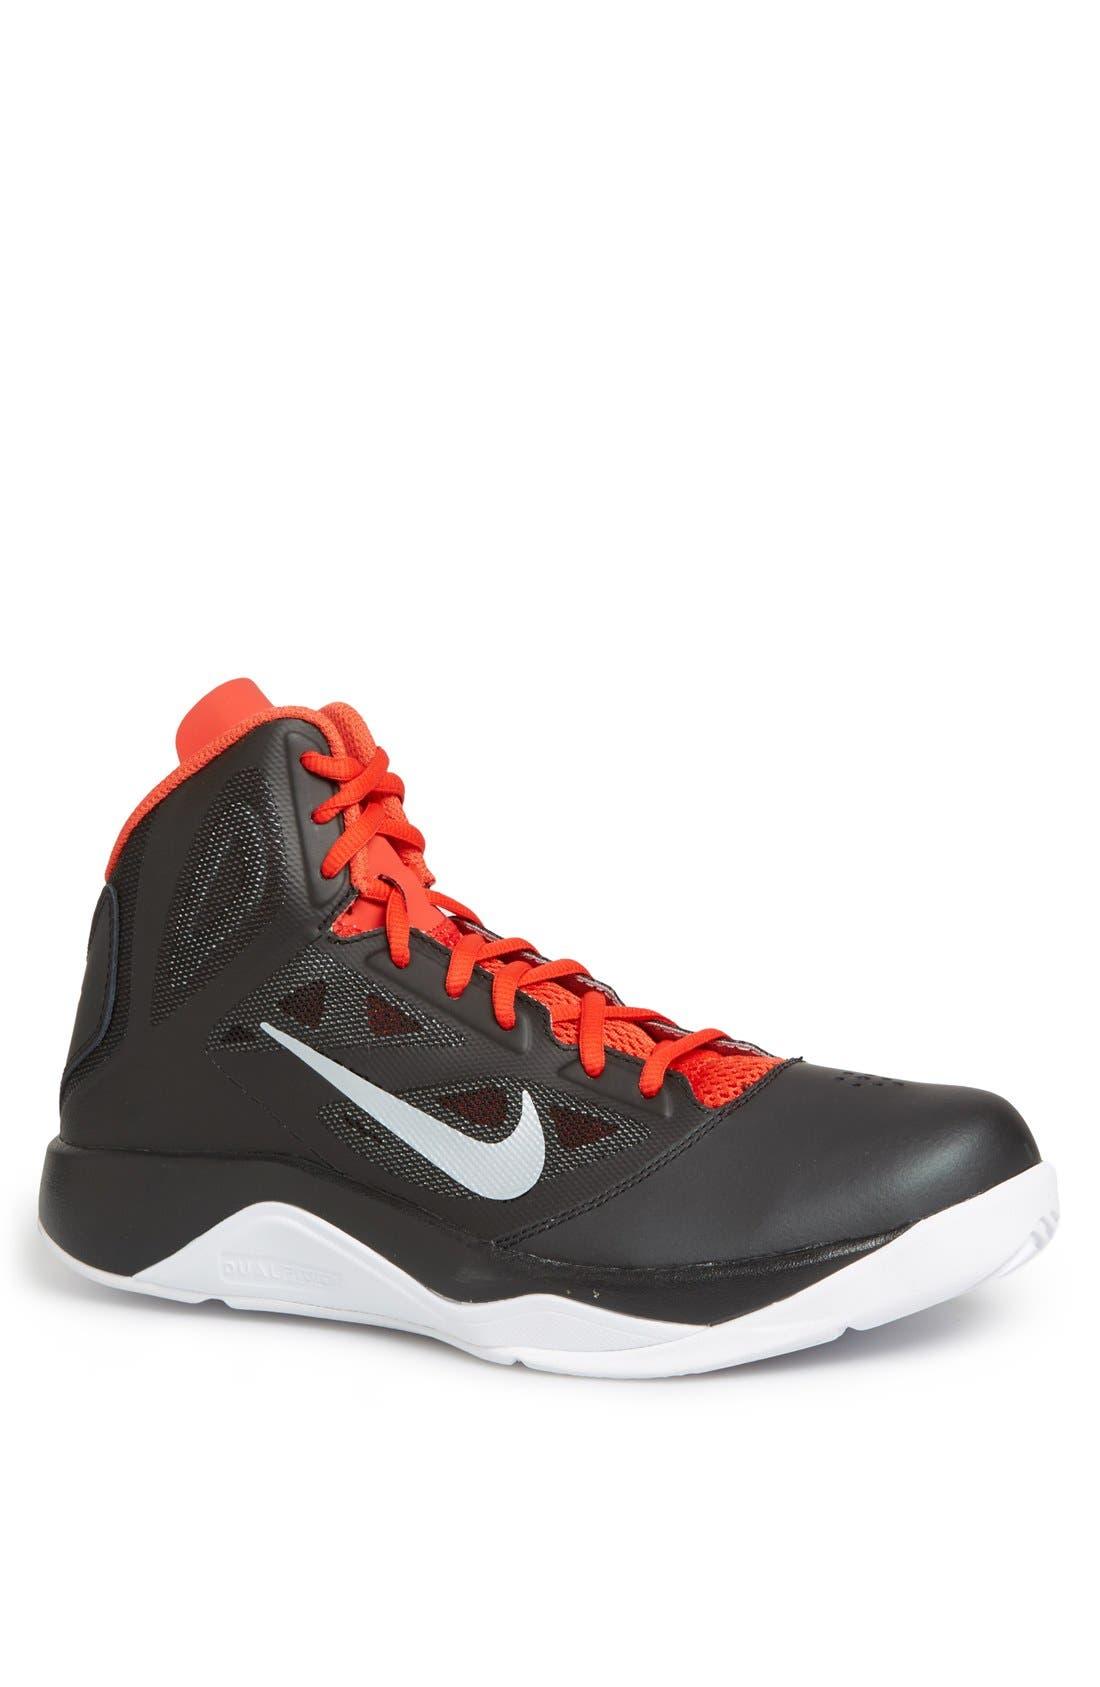 Nike 'Dual Fusion II' Basketball Shoe